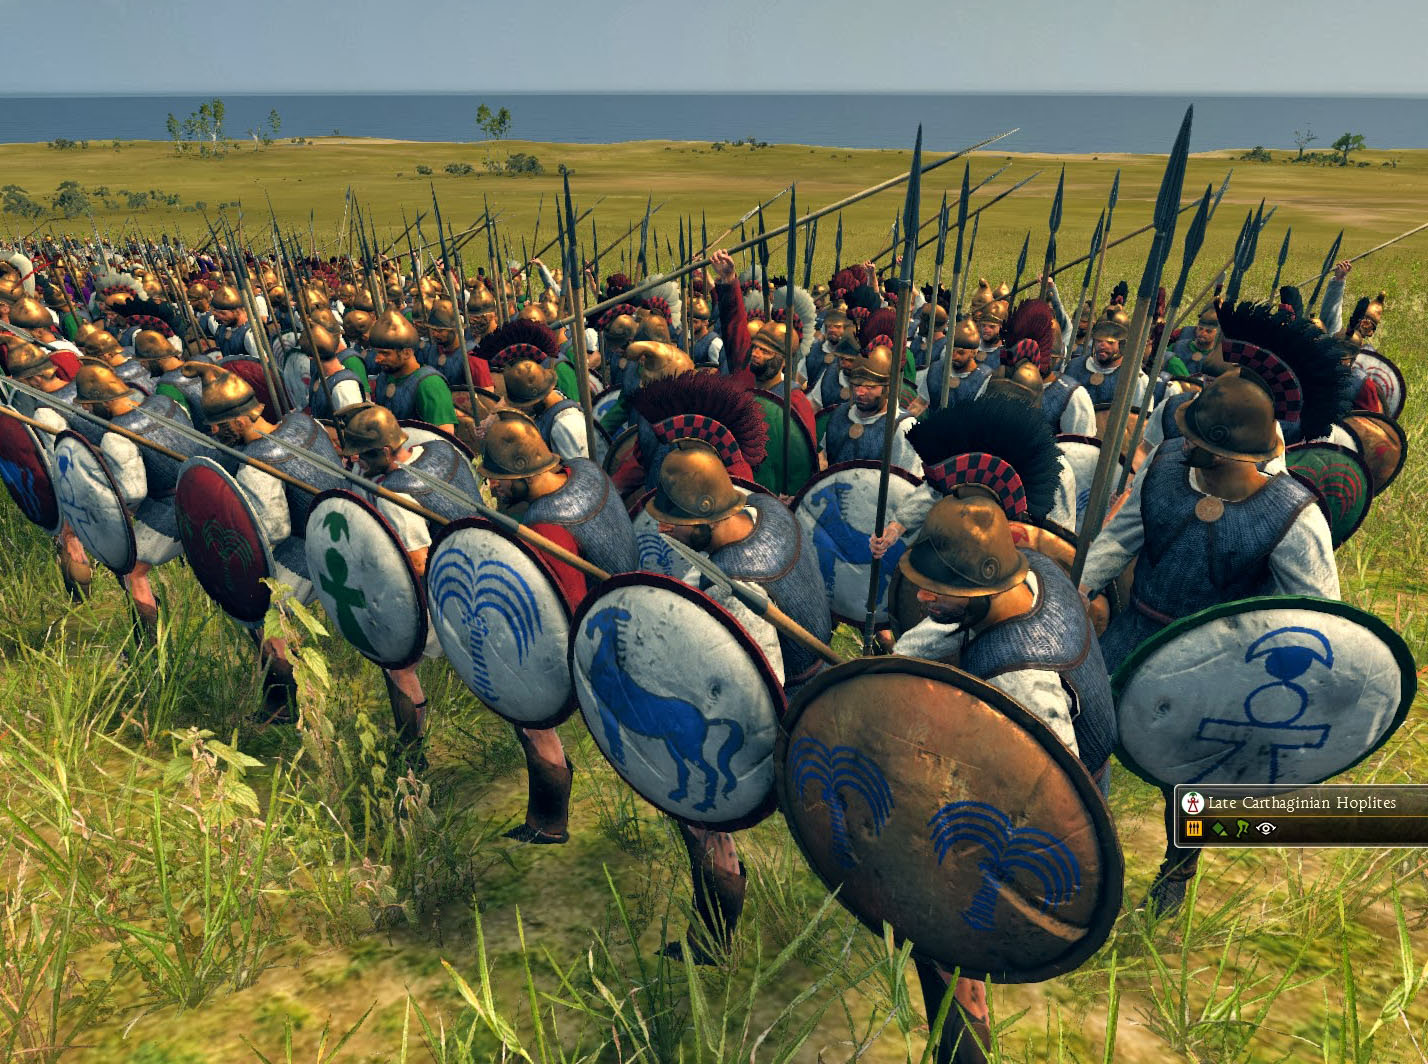 Late Carthaginian Hoplites   Total War Wiki   Fandom ...